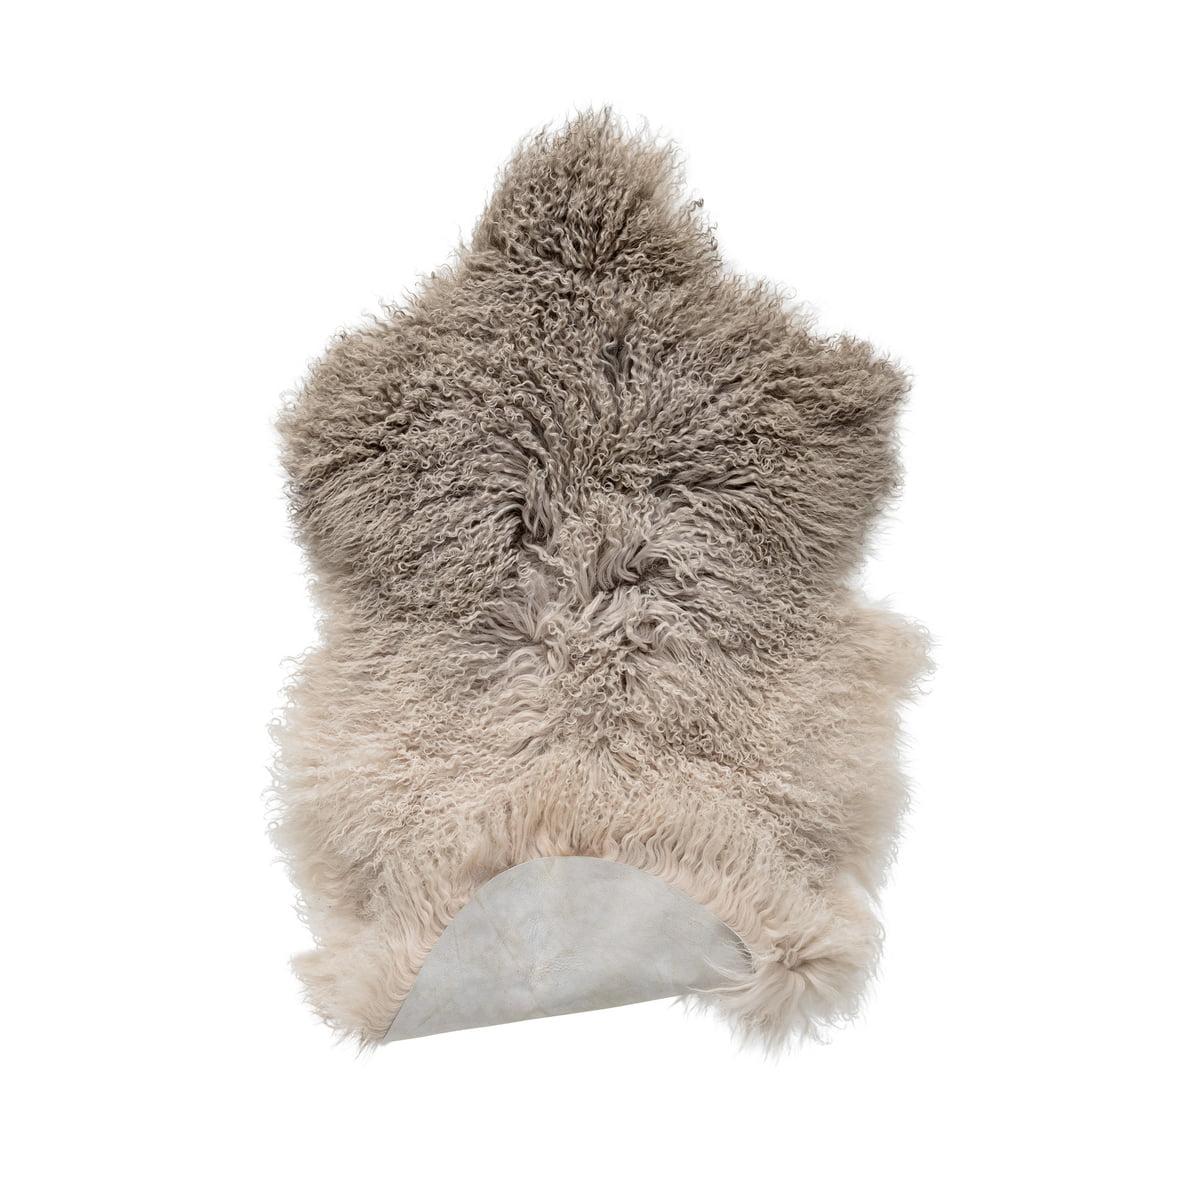 Sheepskin Rug Look: Tibetan Sheepskin Rug